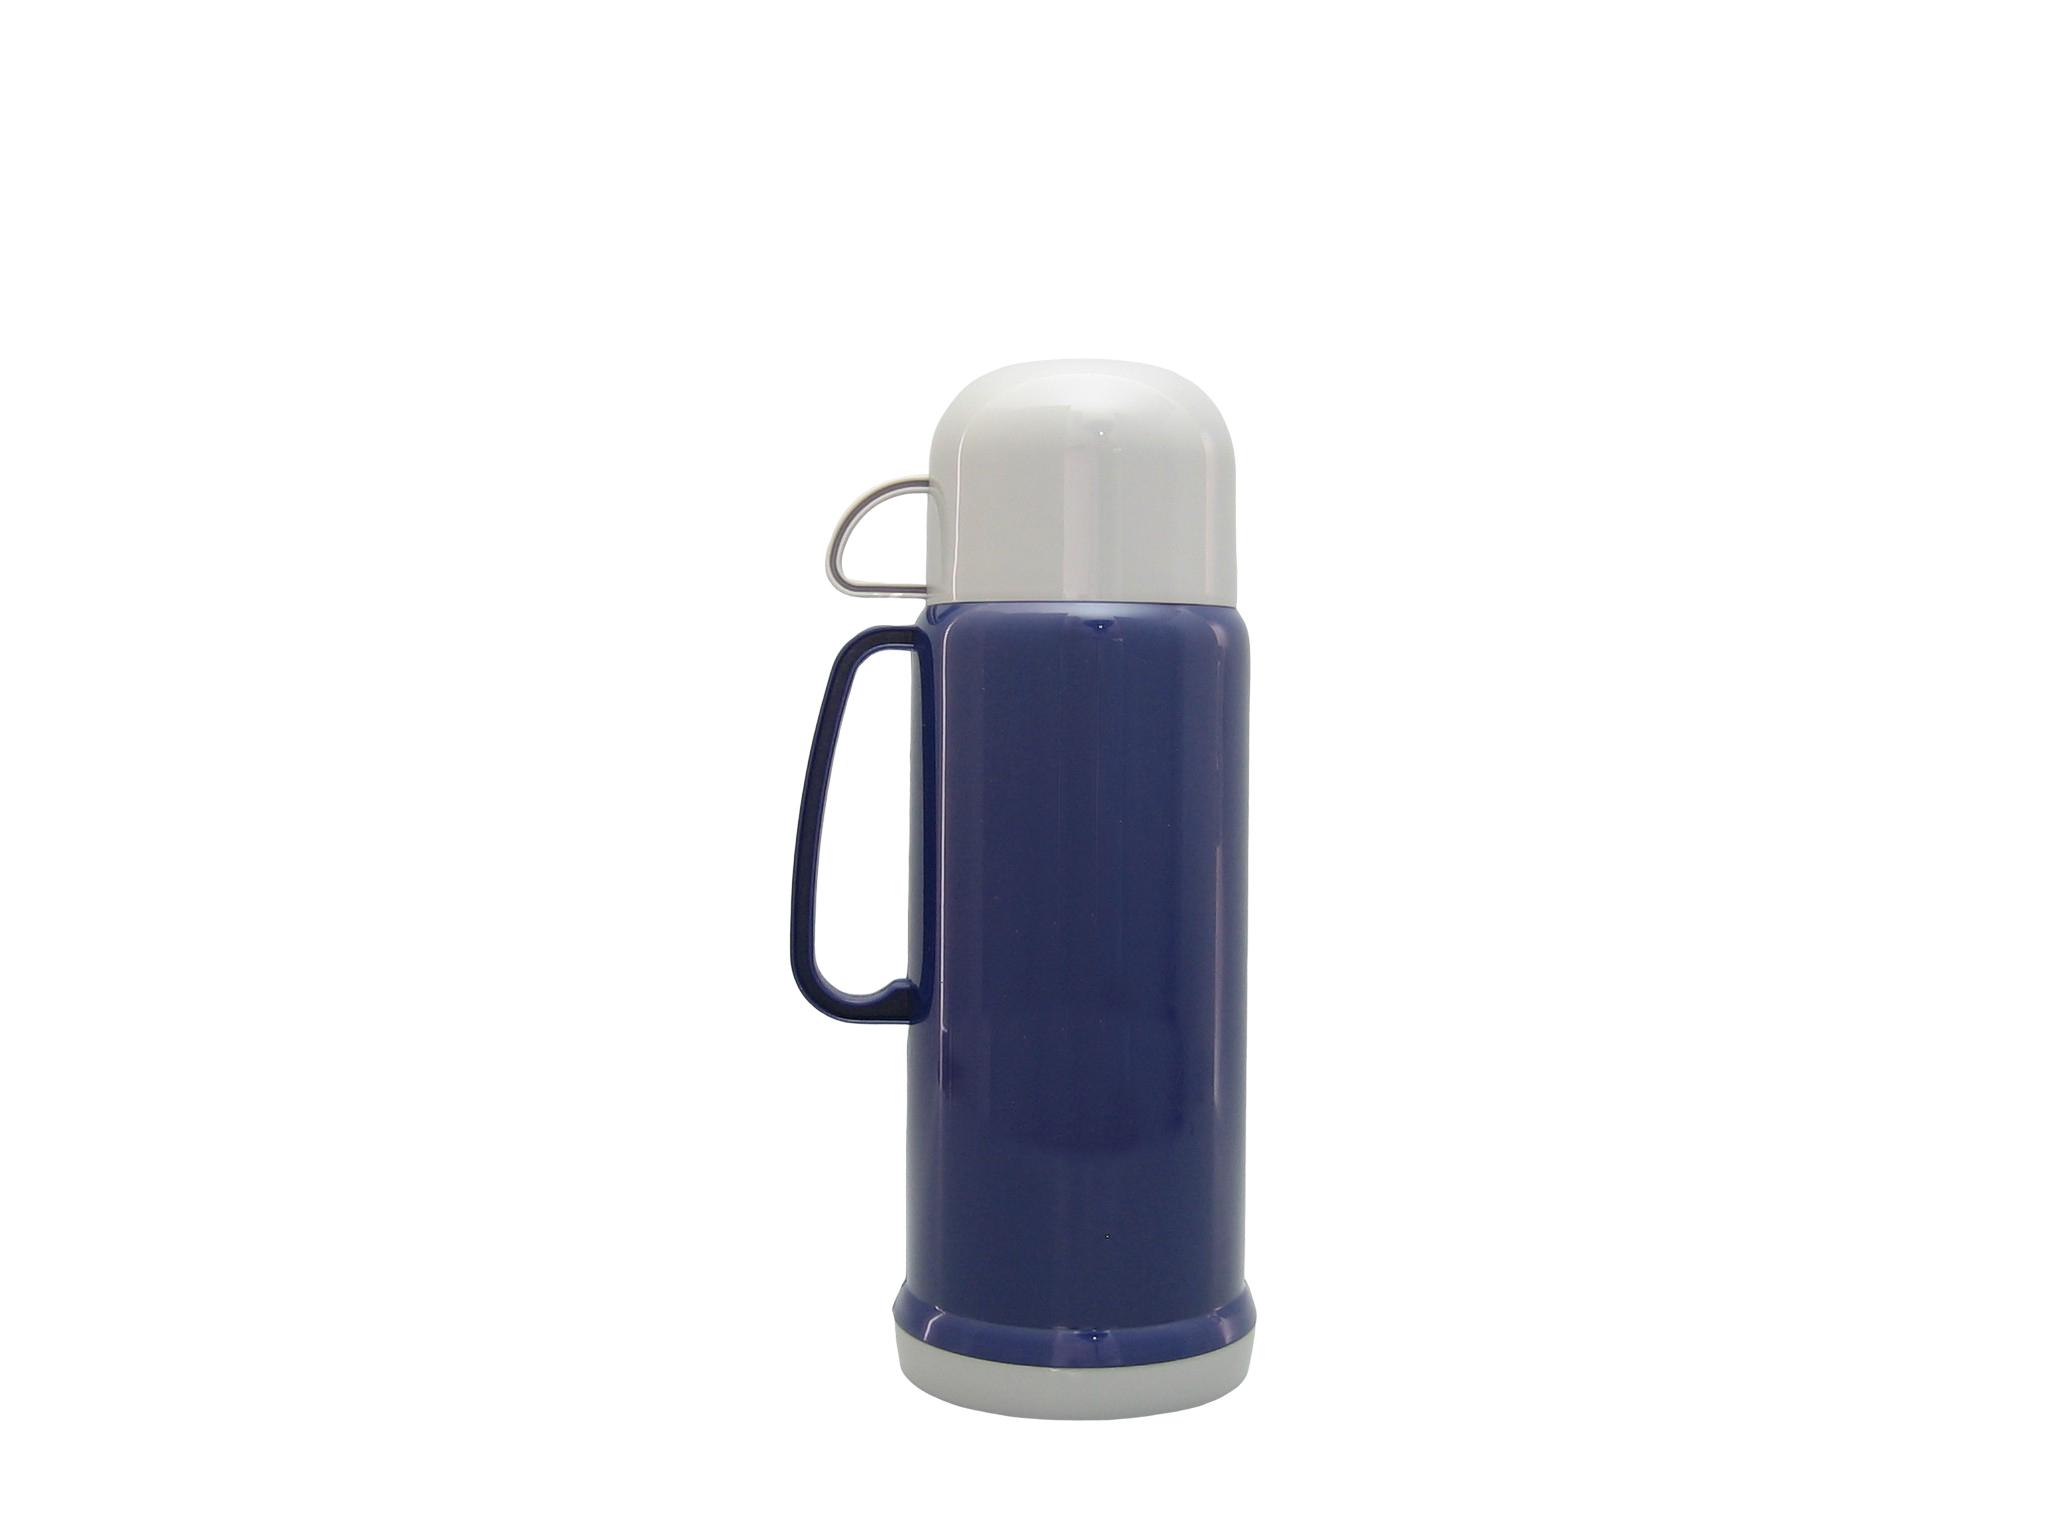 V080Y-008 - Vacuum flask 0.80 L blue - Isobel